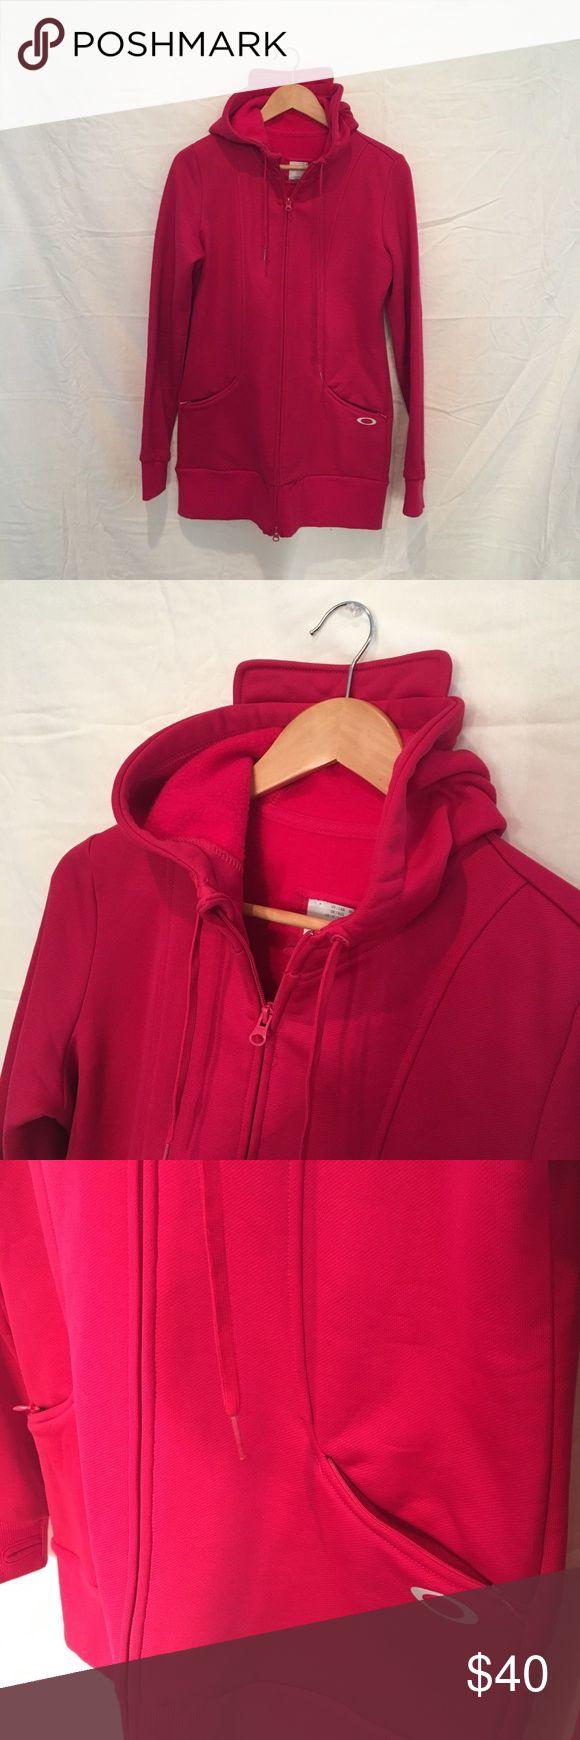 NWOT Oakley Zip Up Hoodie ✨ brand new - never worn! ✨ hot pink zip up hoodie from Oakley Oakley Tops Sweatshirts & Hoodies